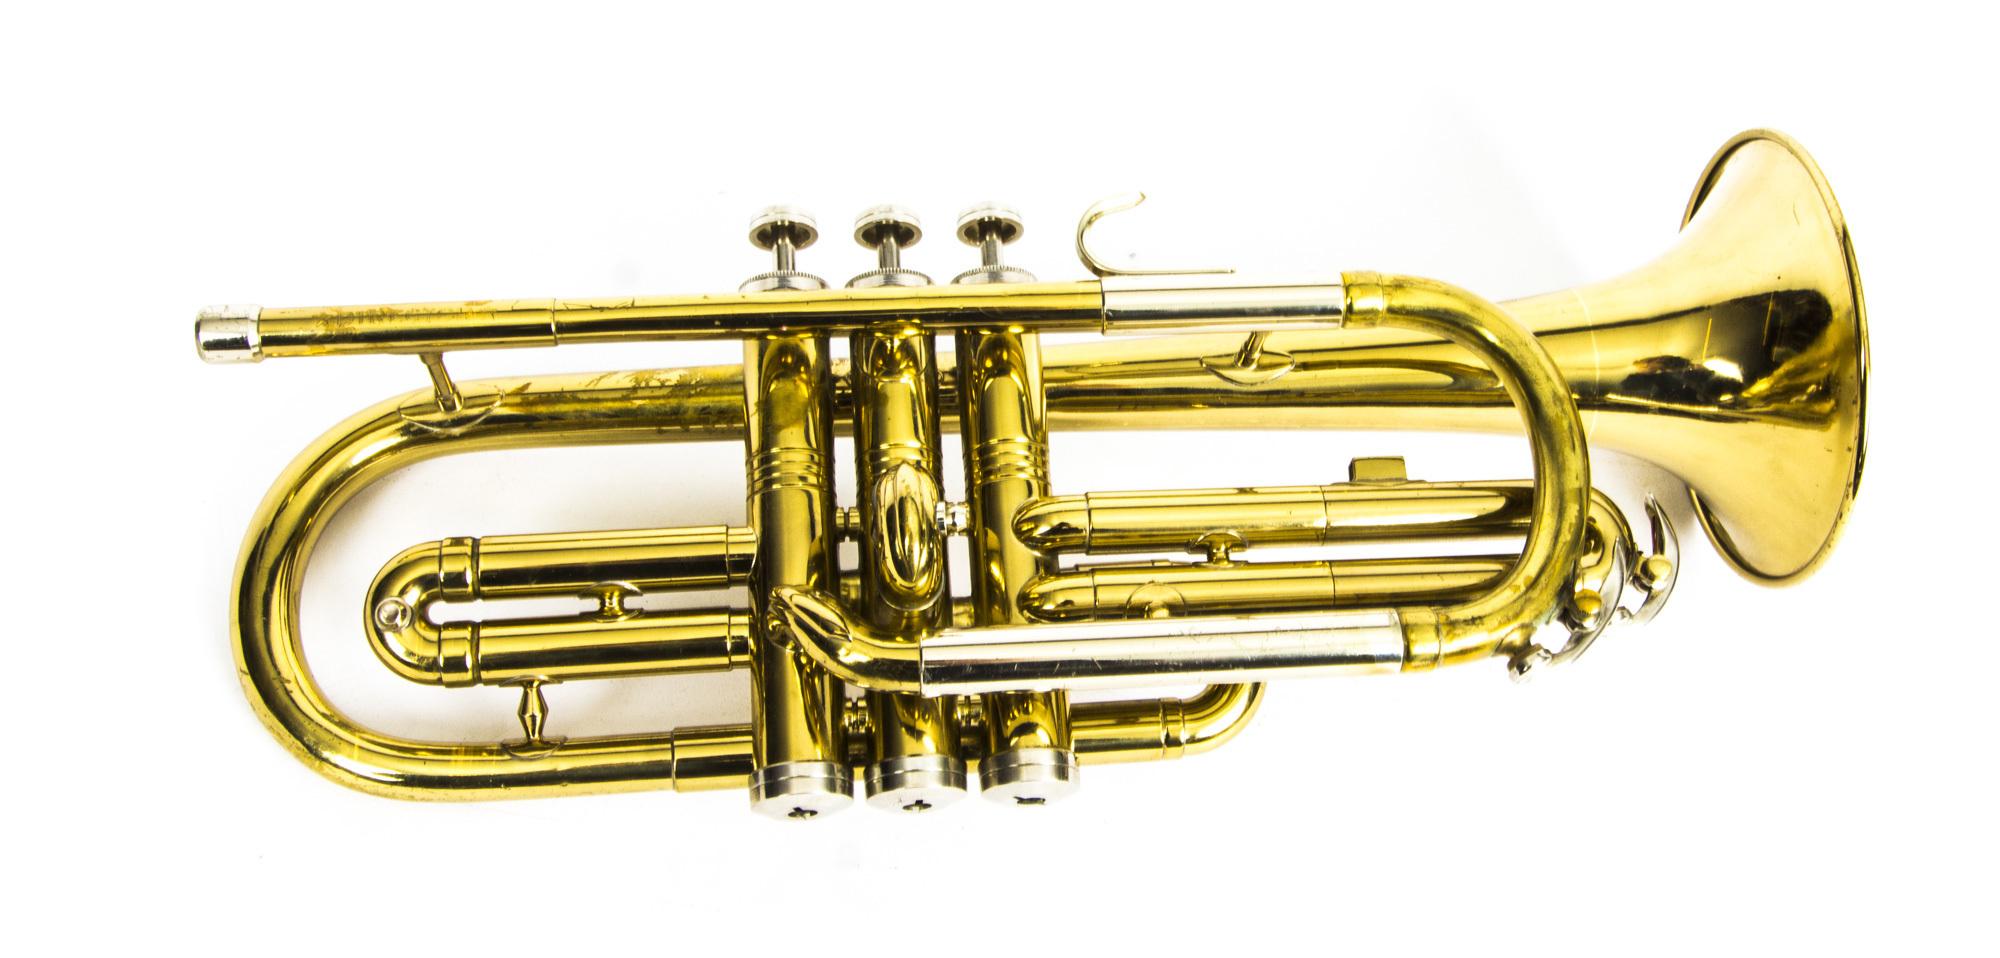 Vintage Brass Cornet Trumpet By Conn Original Case Mother Of Pearl Keys